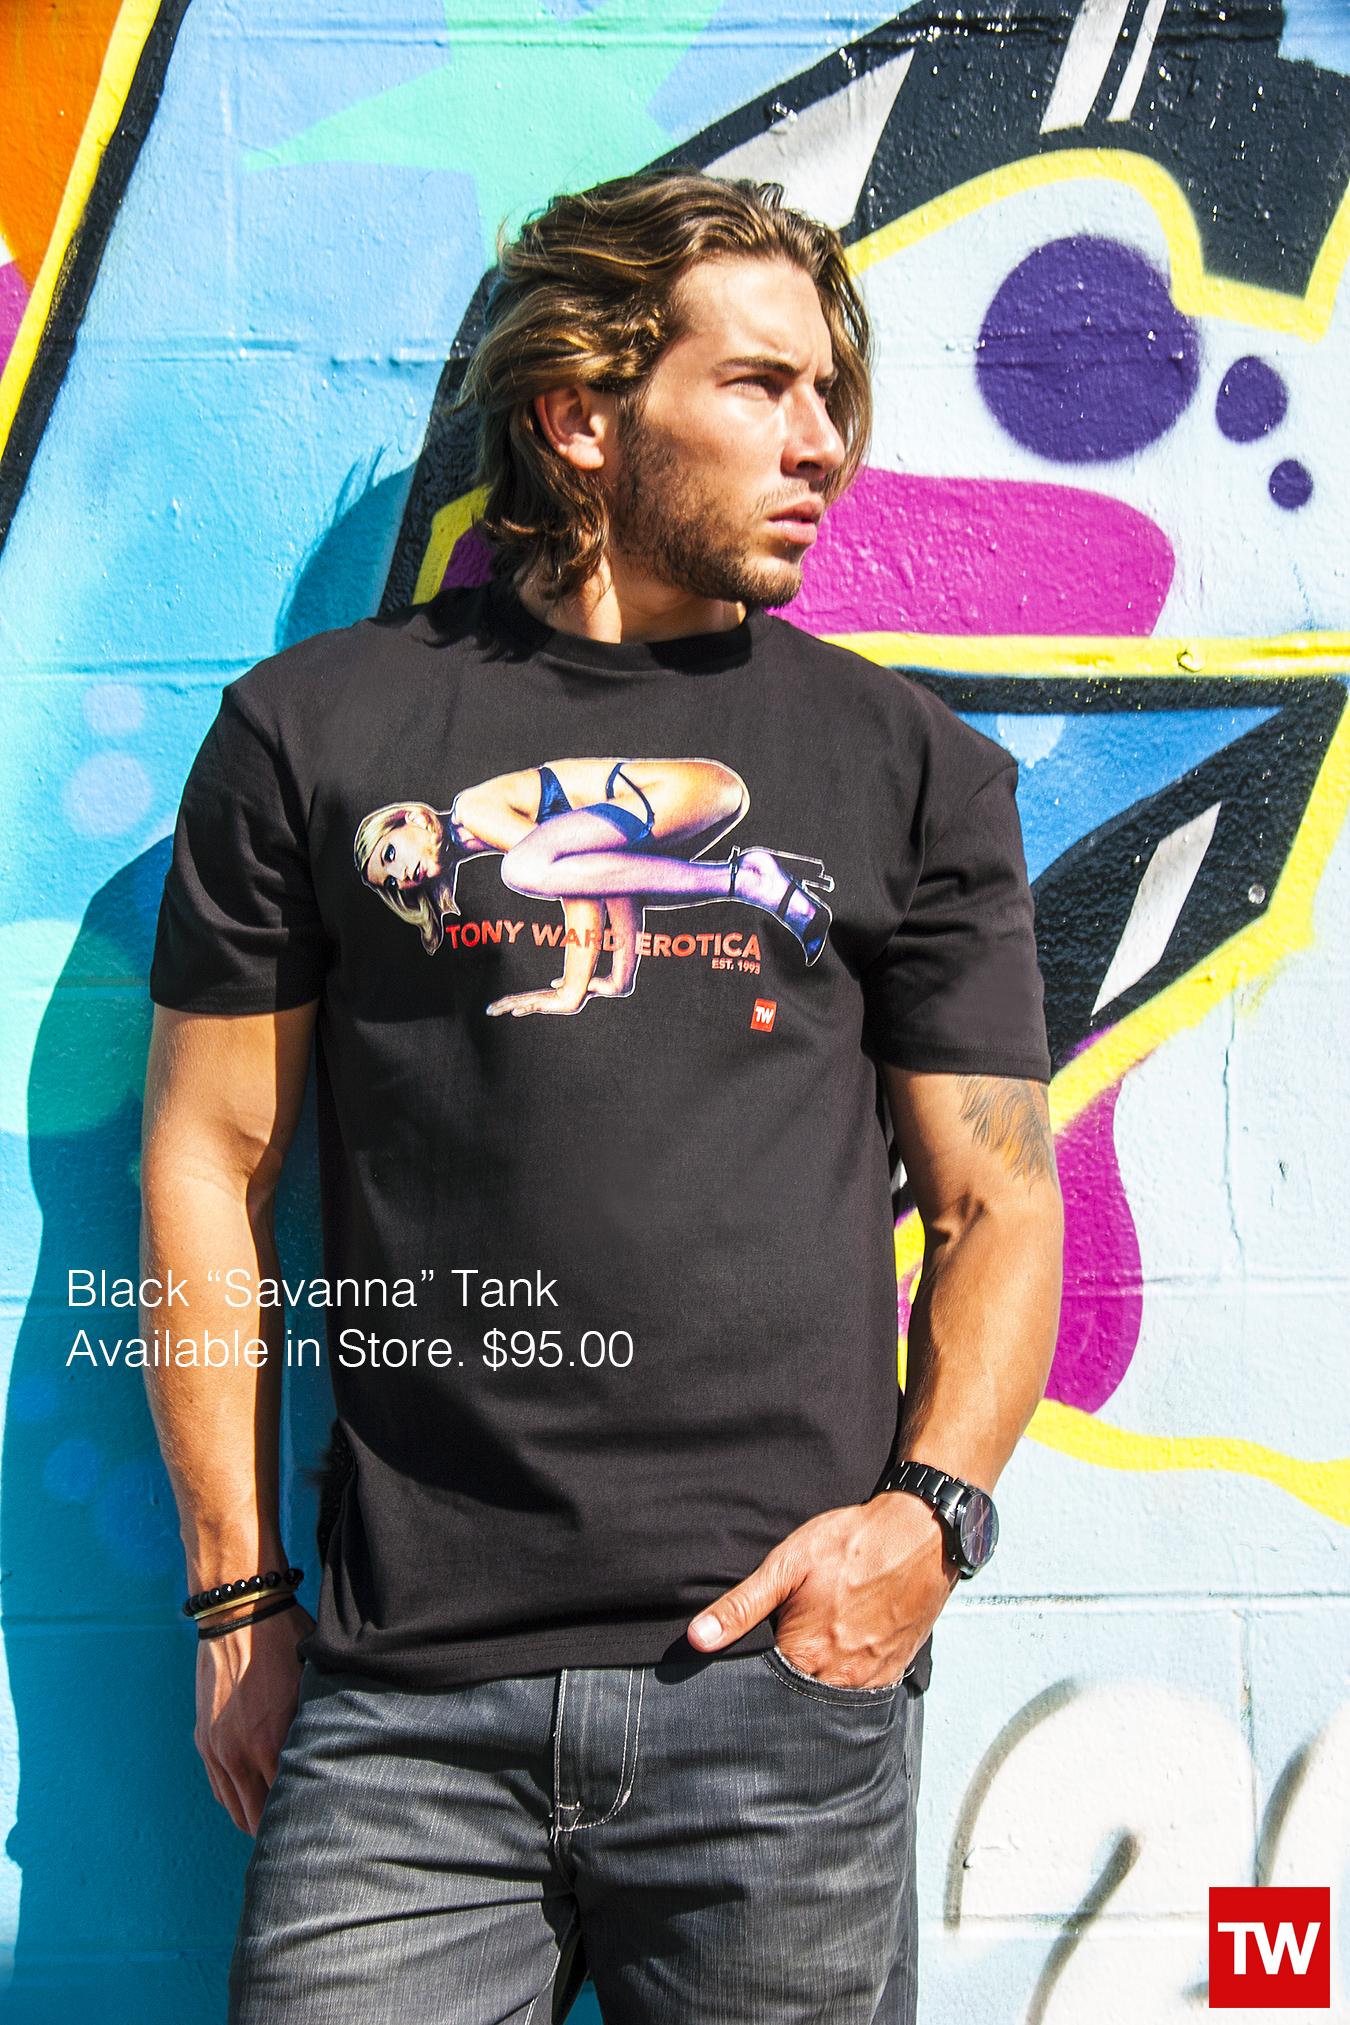 Tony_Ward_Studio_e_commerce_store_t-shirts_black_Savanna_tee_sale_model_Luis